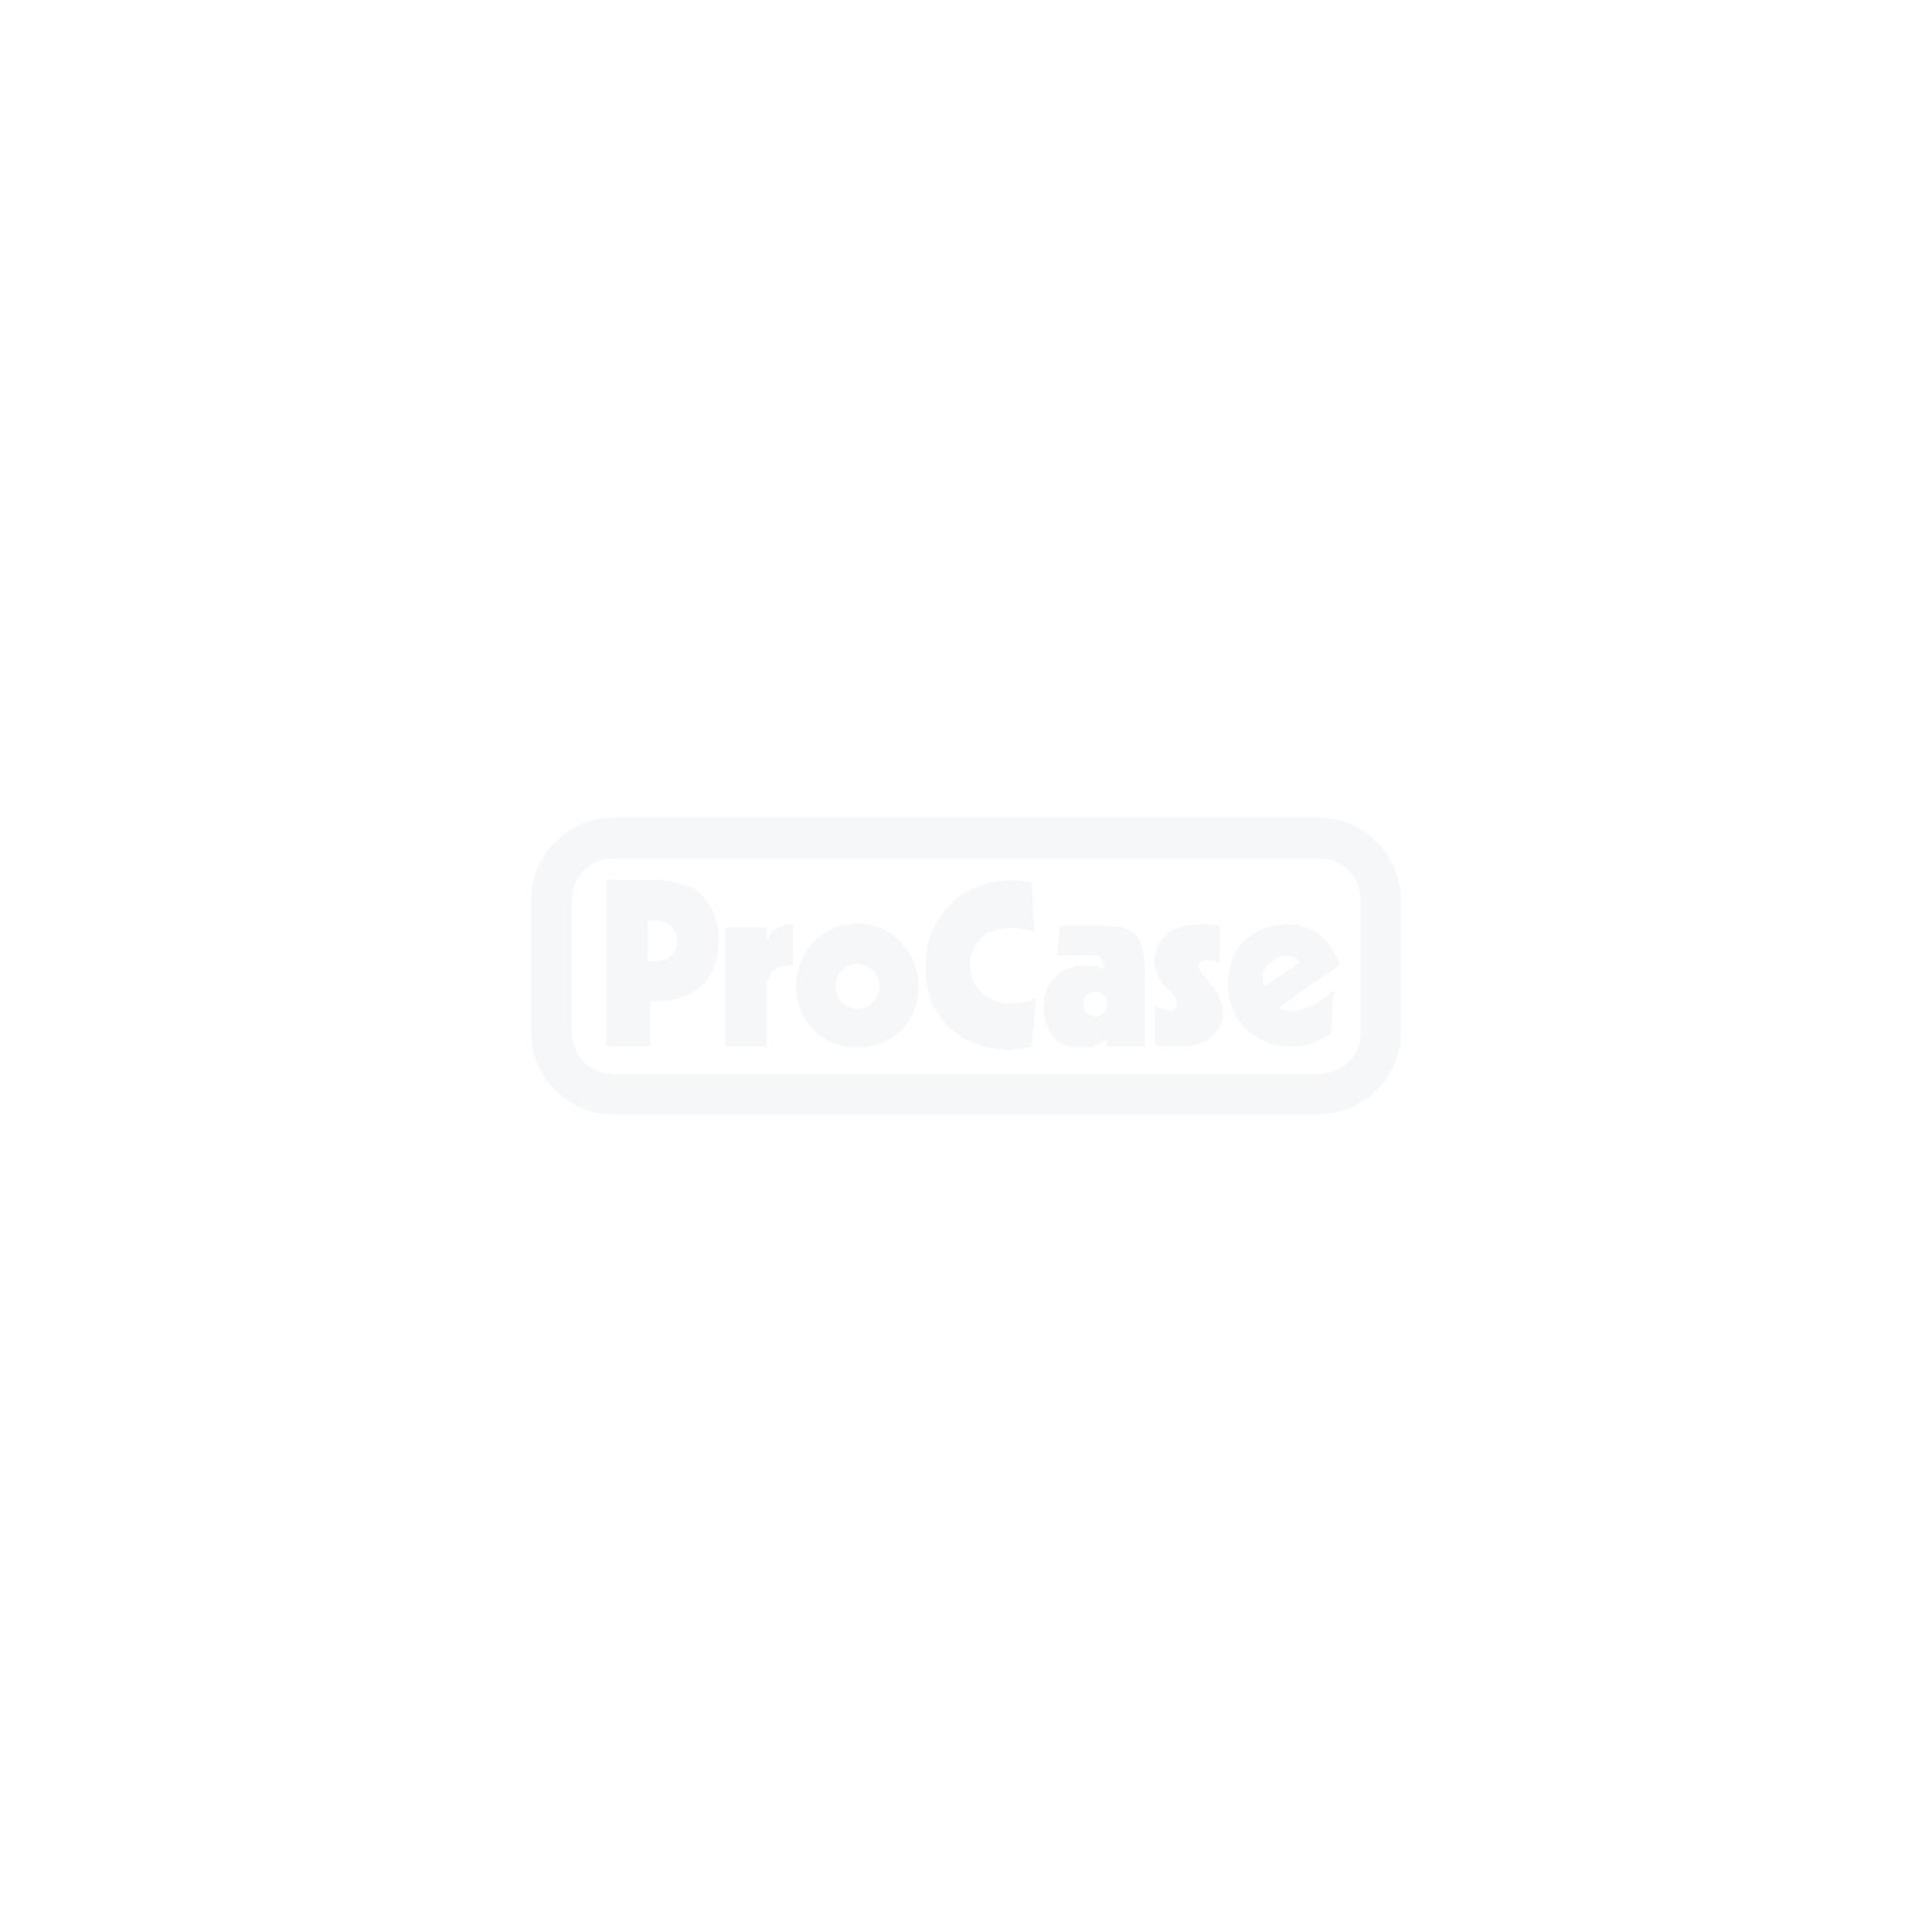 Flightcase für 1 St. Eyevis Eye-LCD-7000-LE-500/700 3